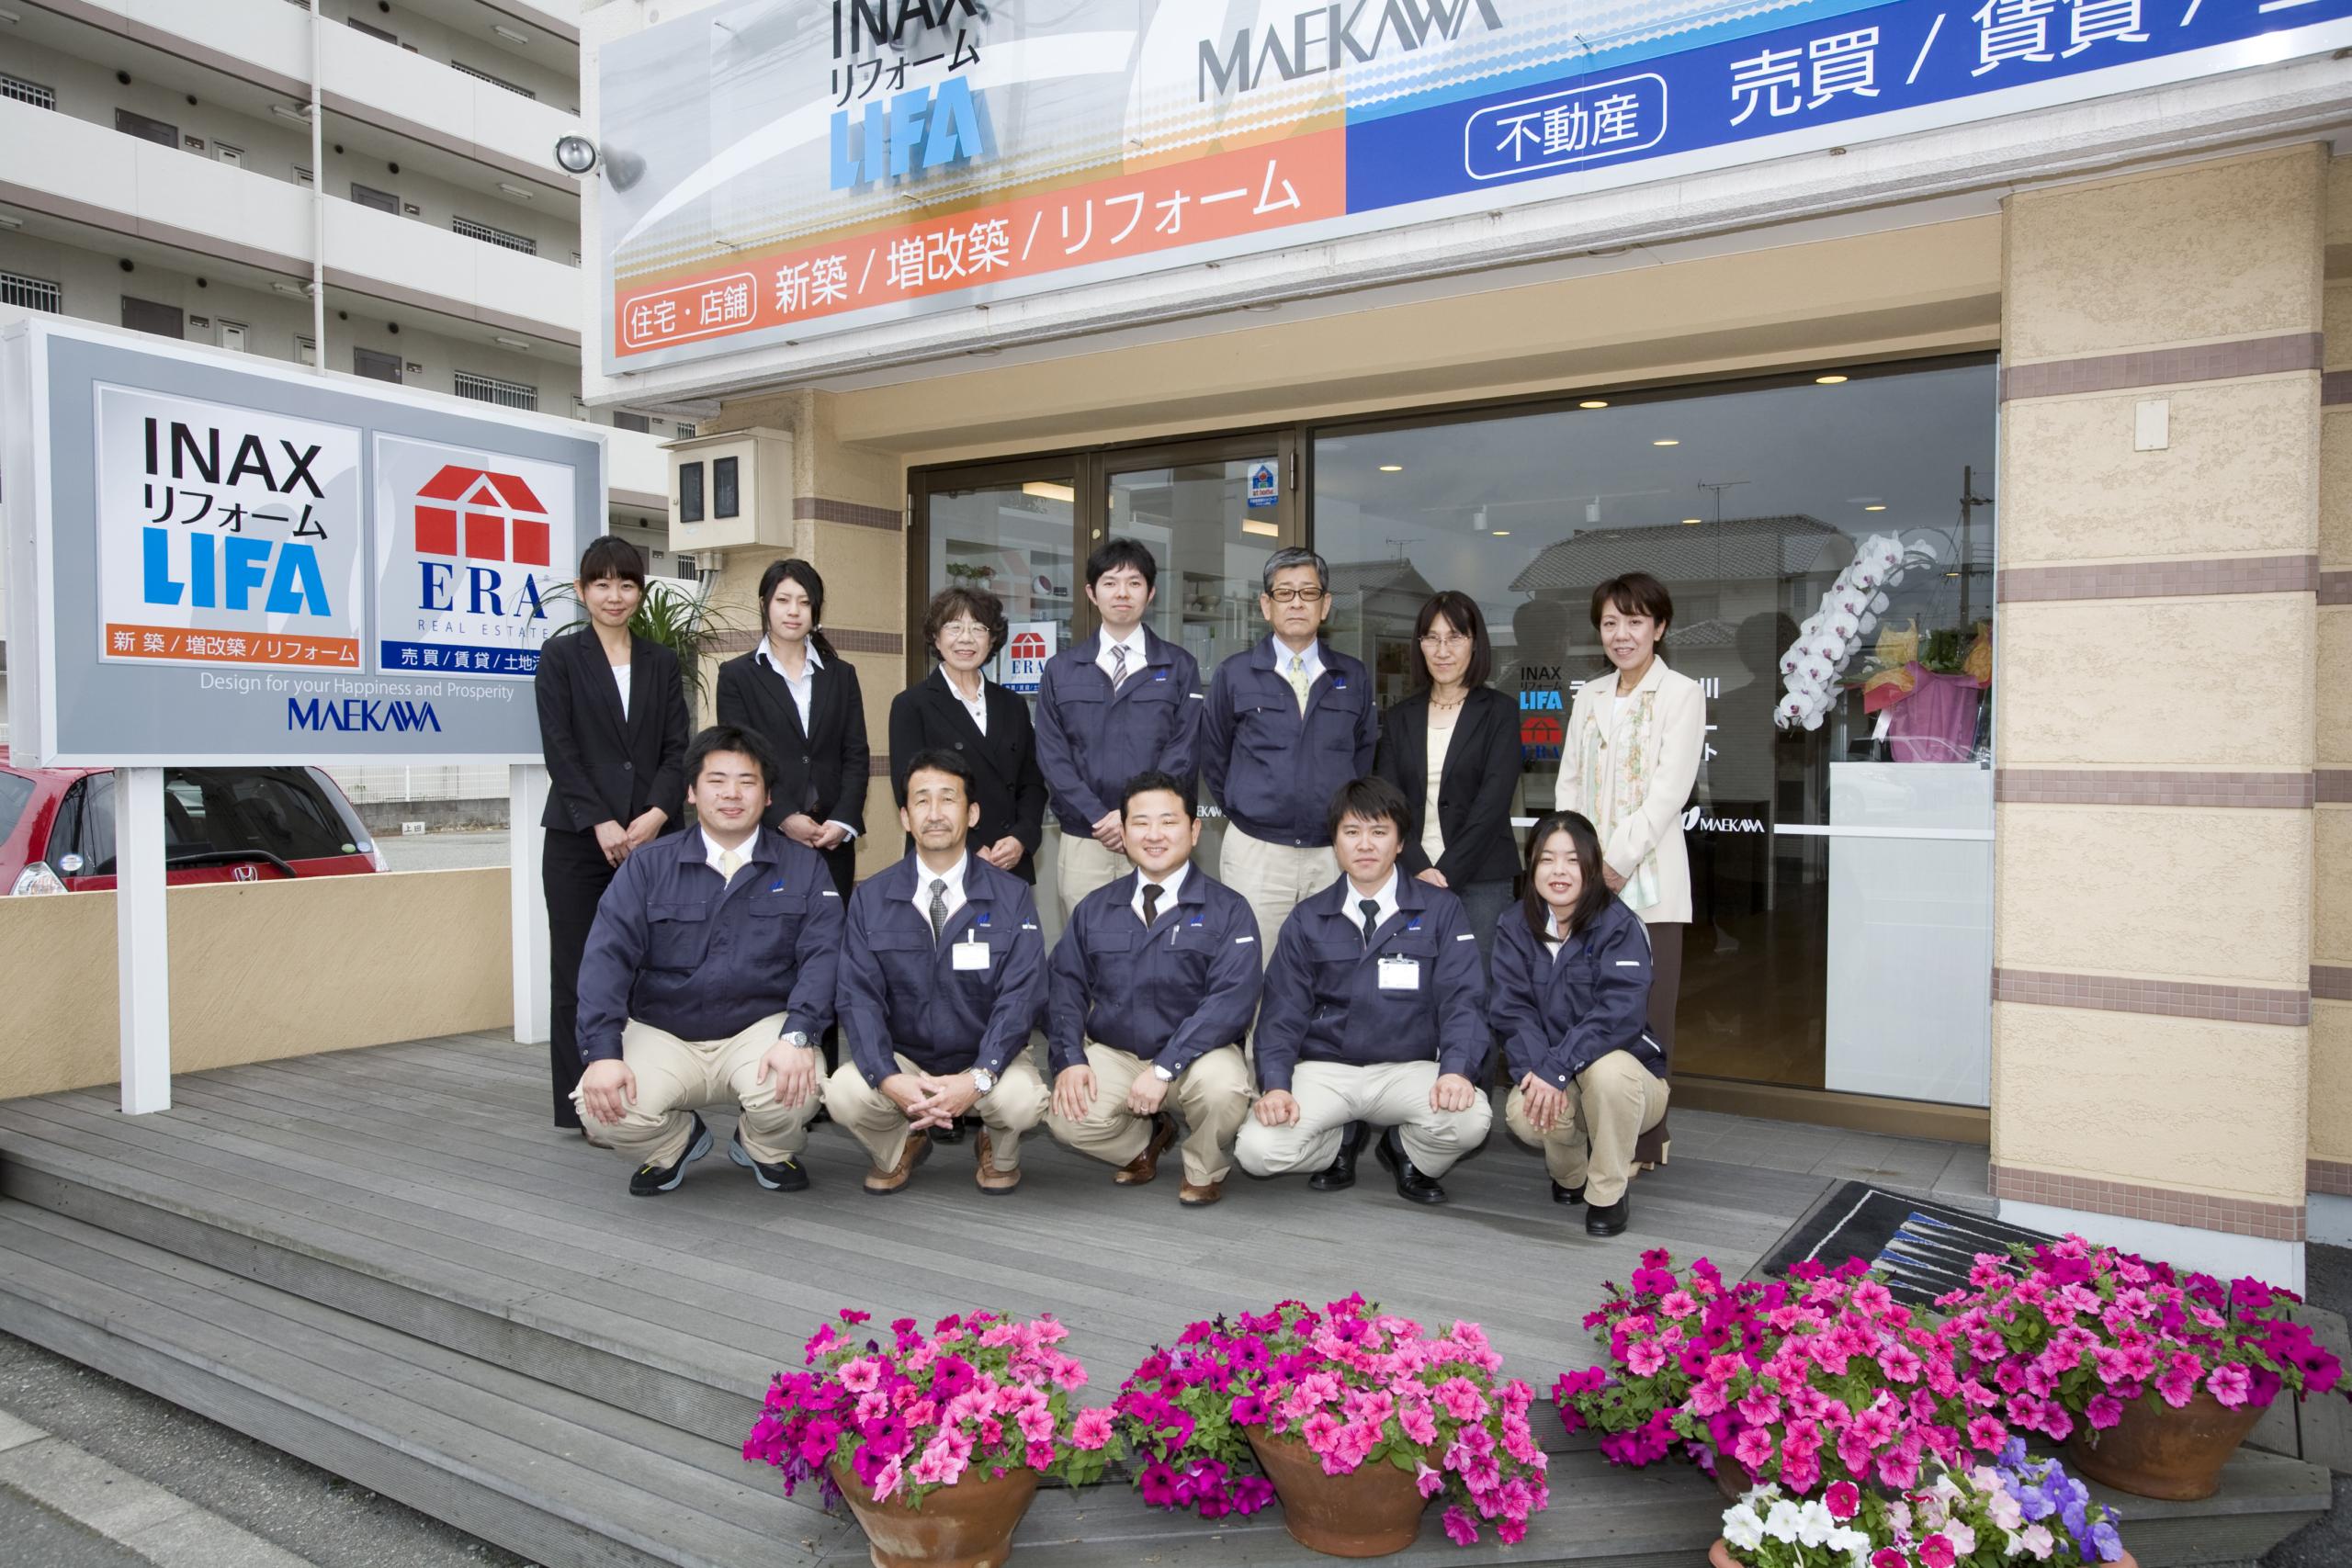 前川建設株式会社 ライファ加古川